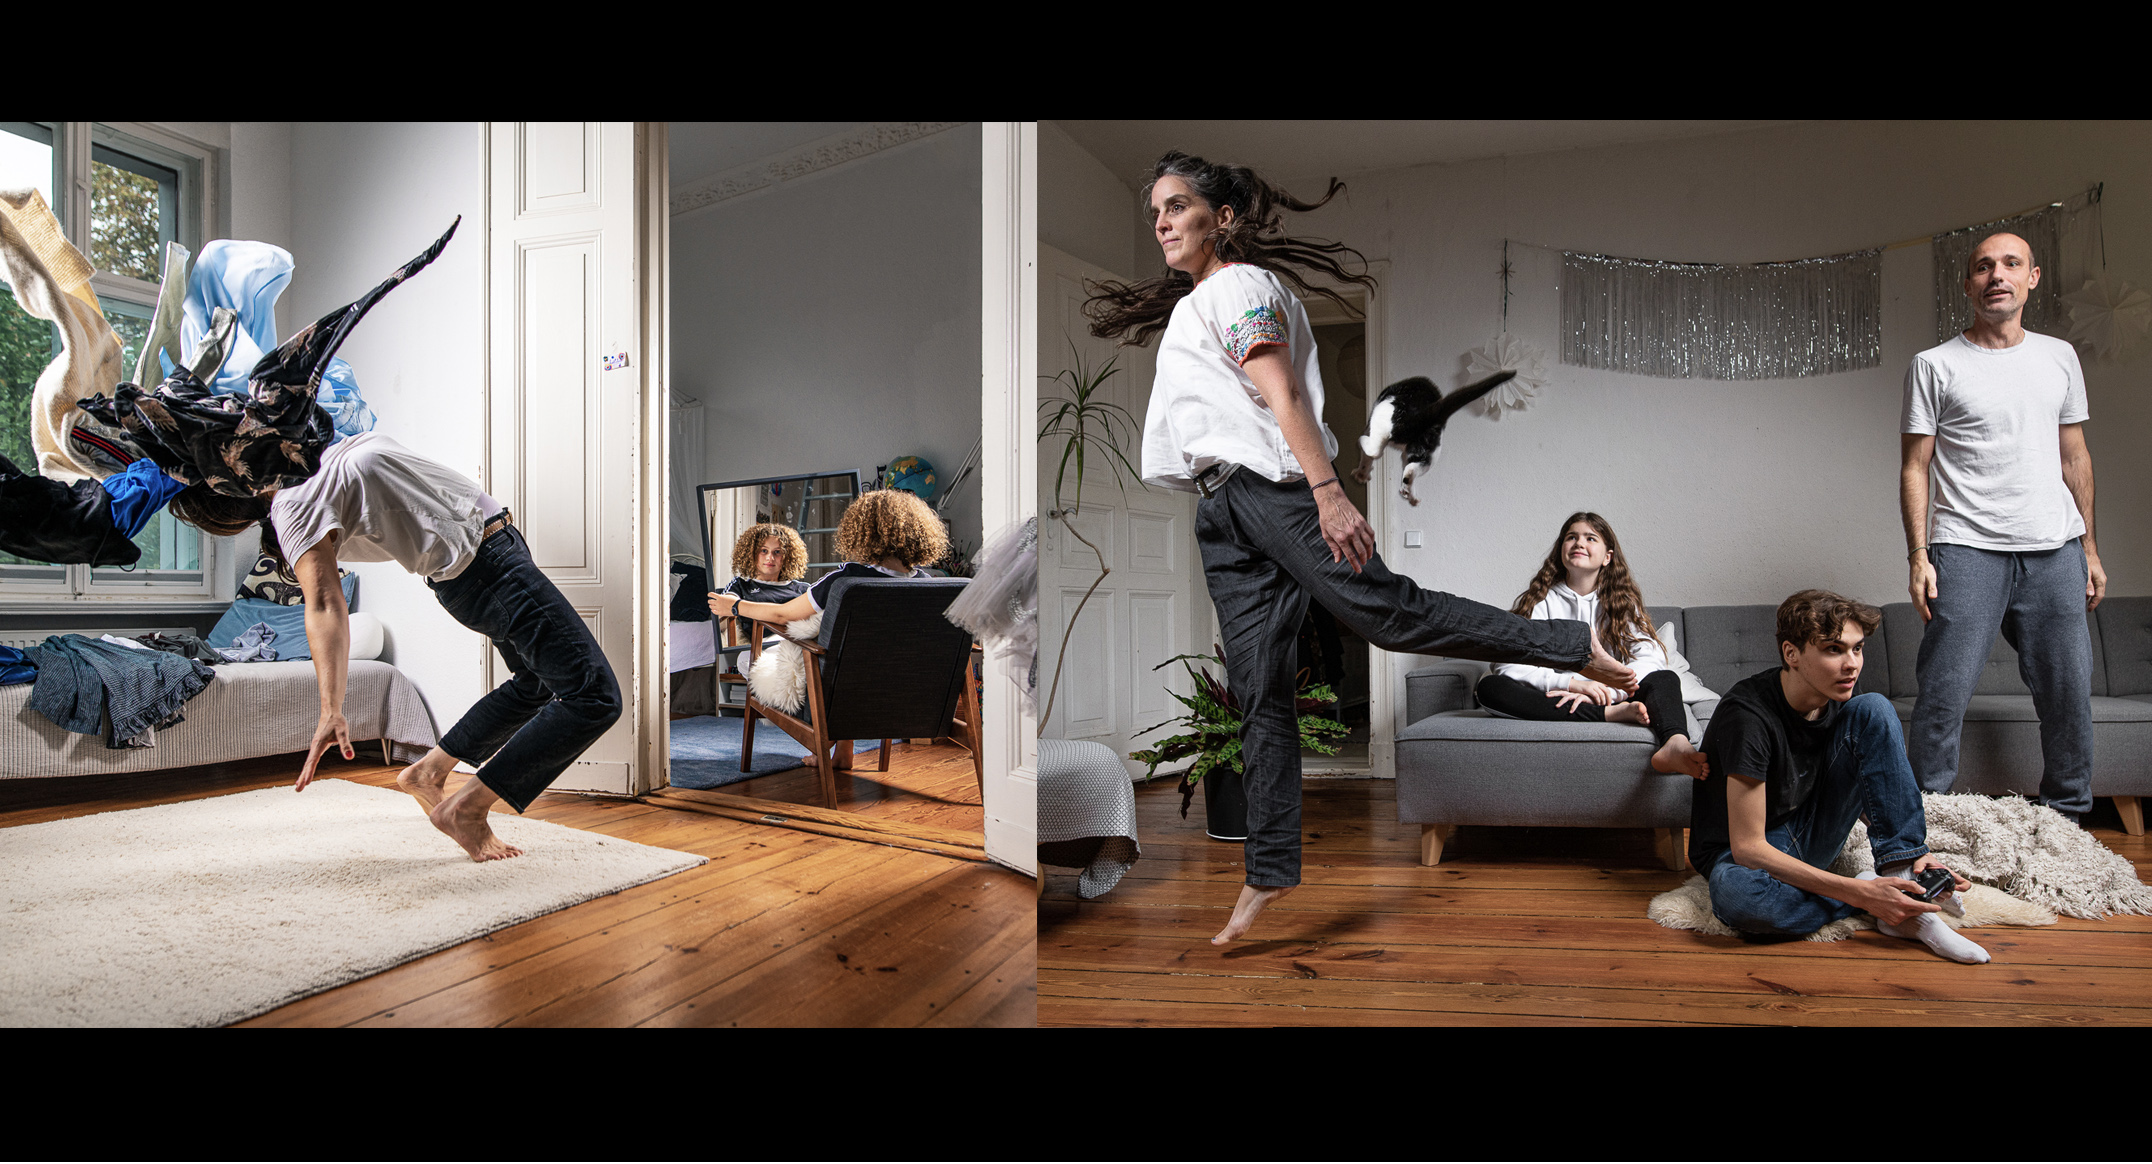 Tanzkomplizen_Familienporträts3+5_Doppelvorstellung